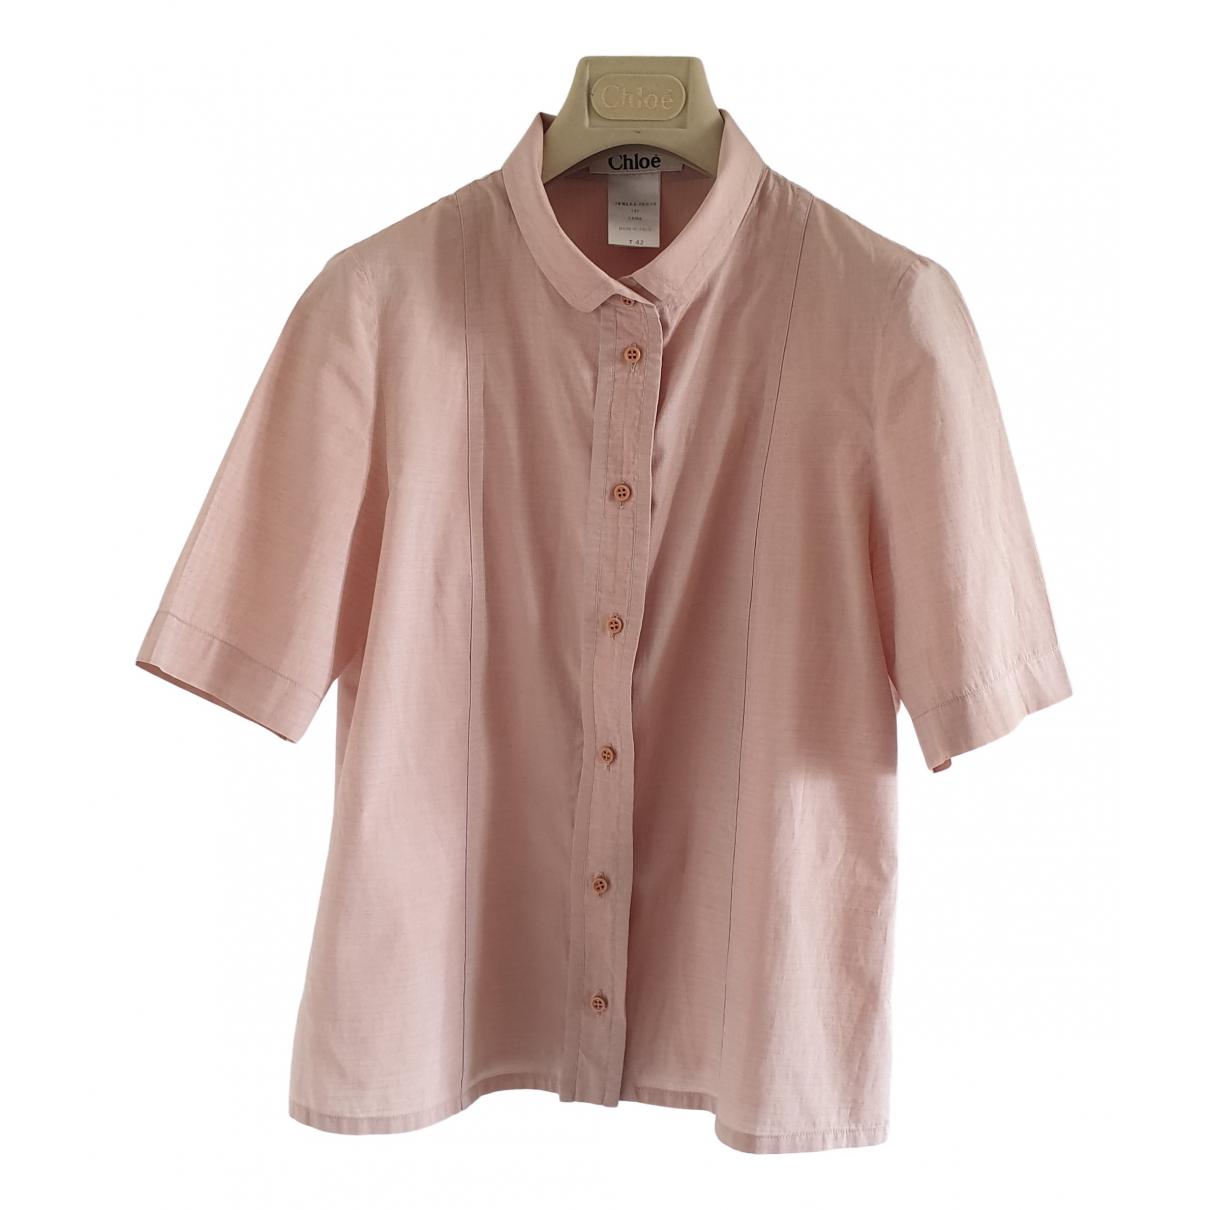 Chloé \N Pink Cotton  top for Women 42 IT